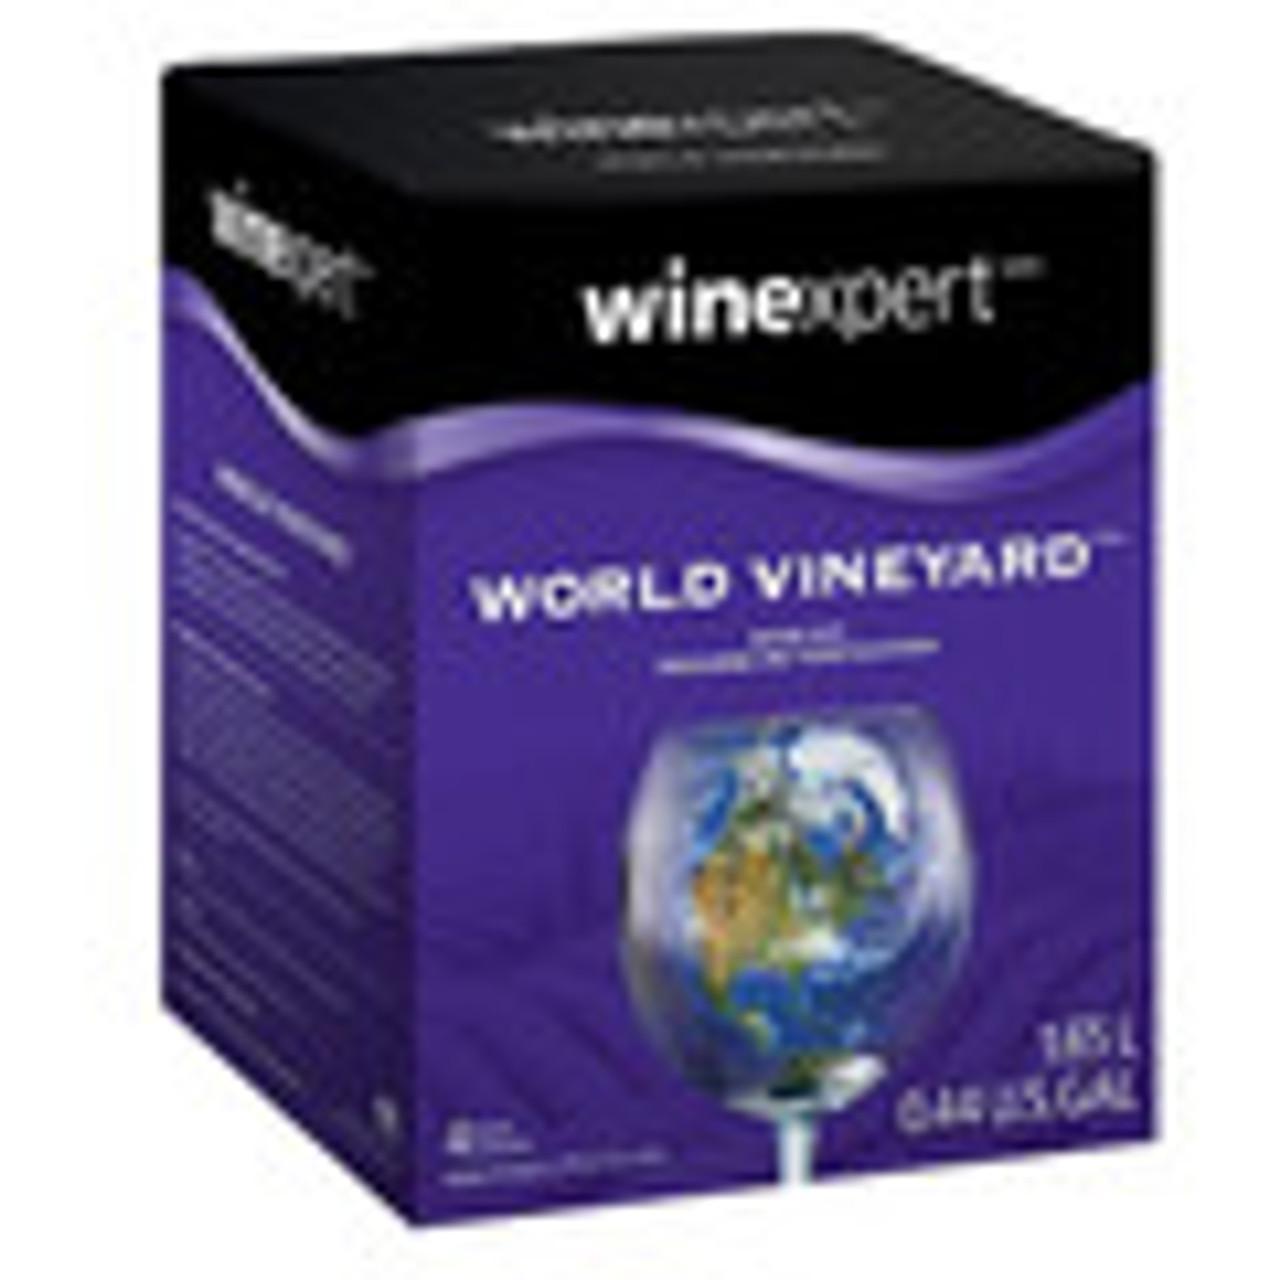 World Vineyard (1 Gallon)